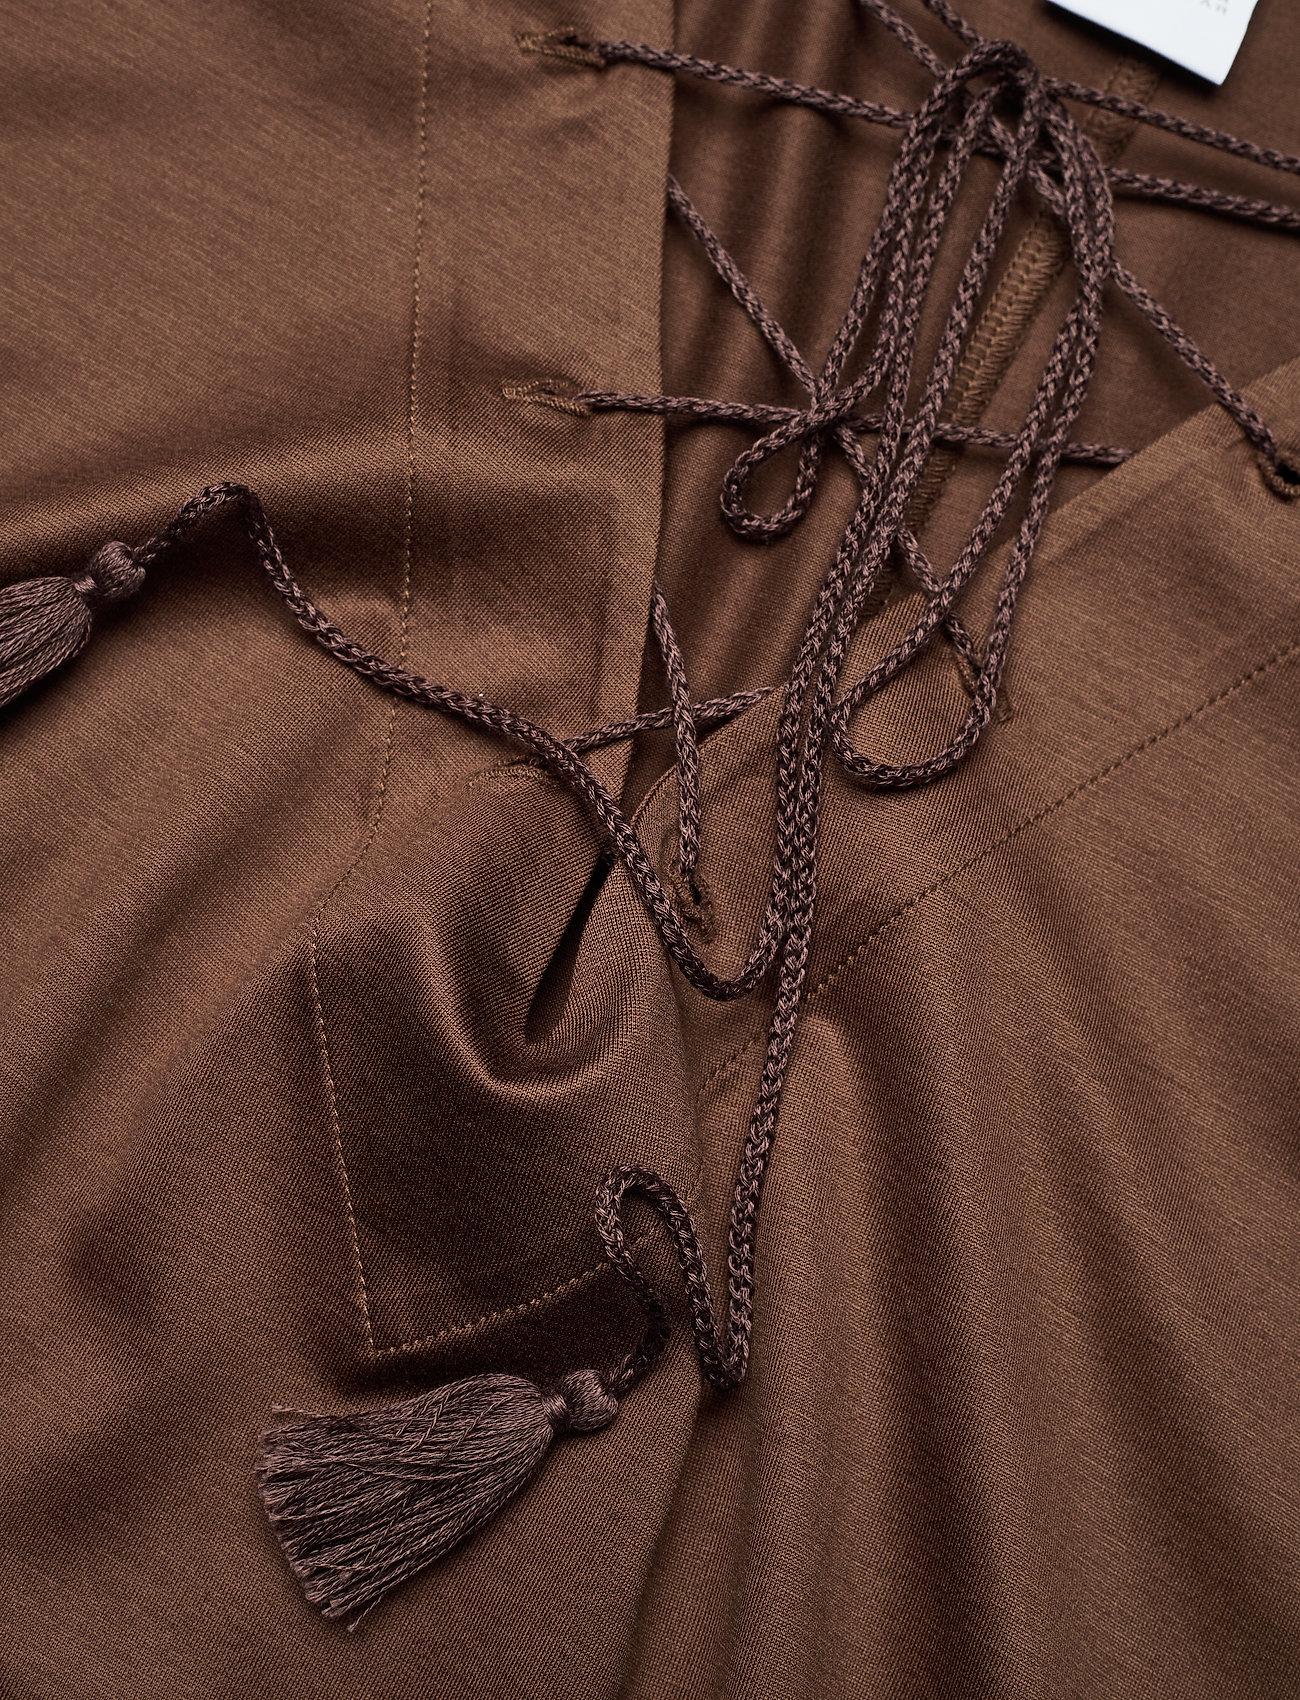 Max Mara Leisure - PROSIT - beachwear - brown - 2